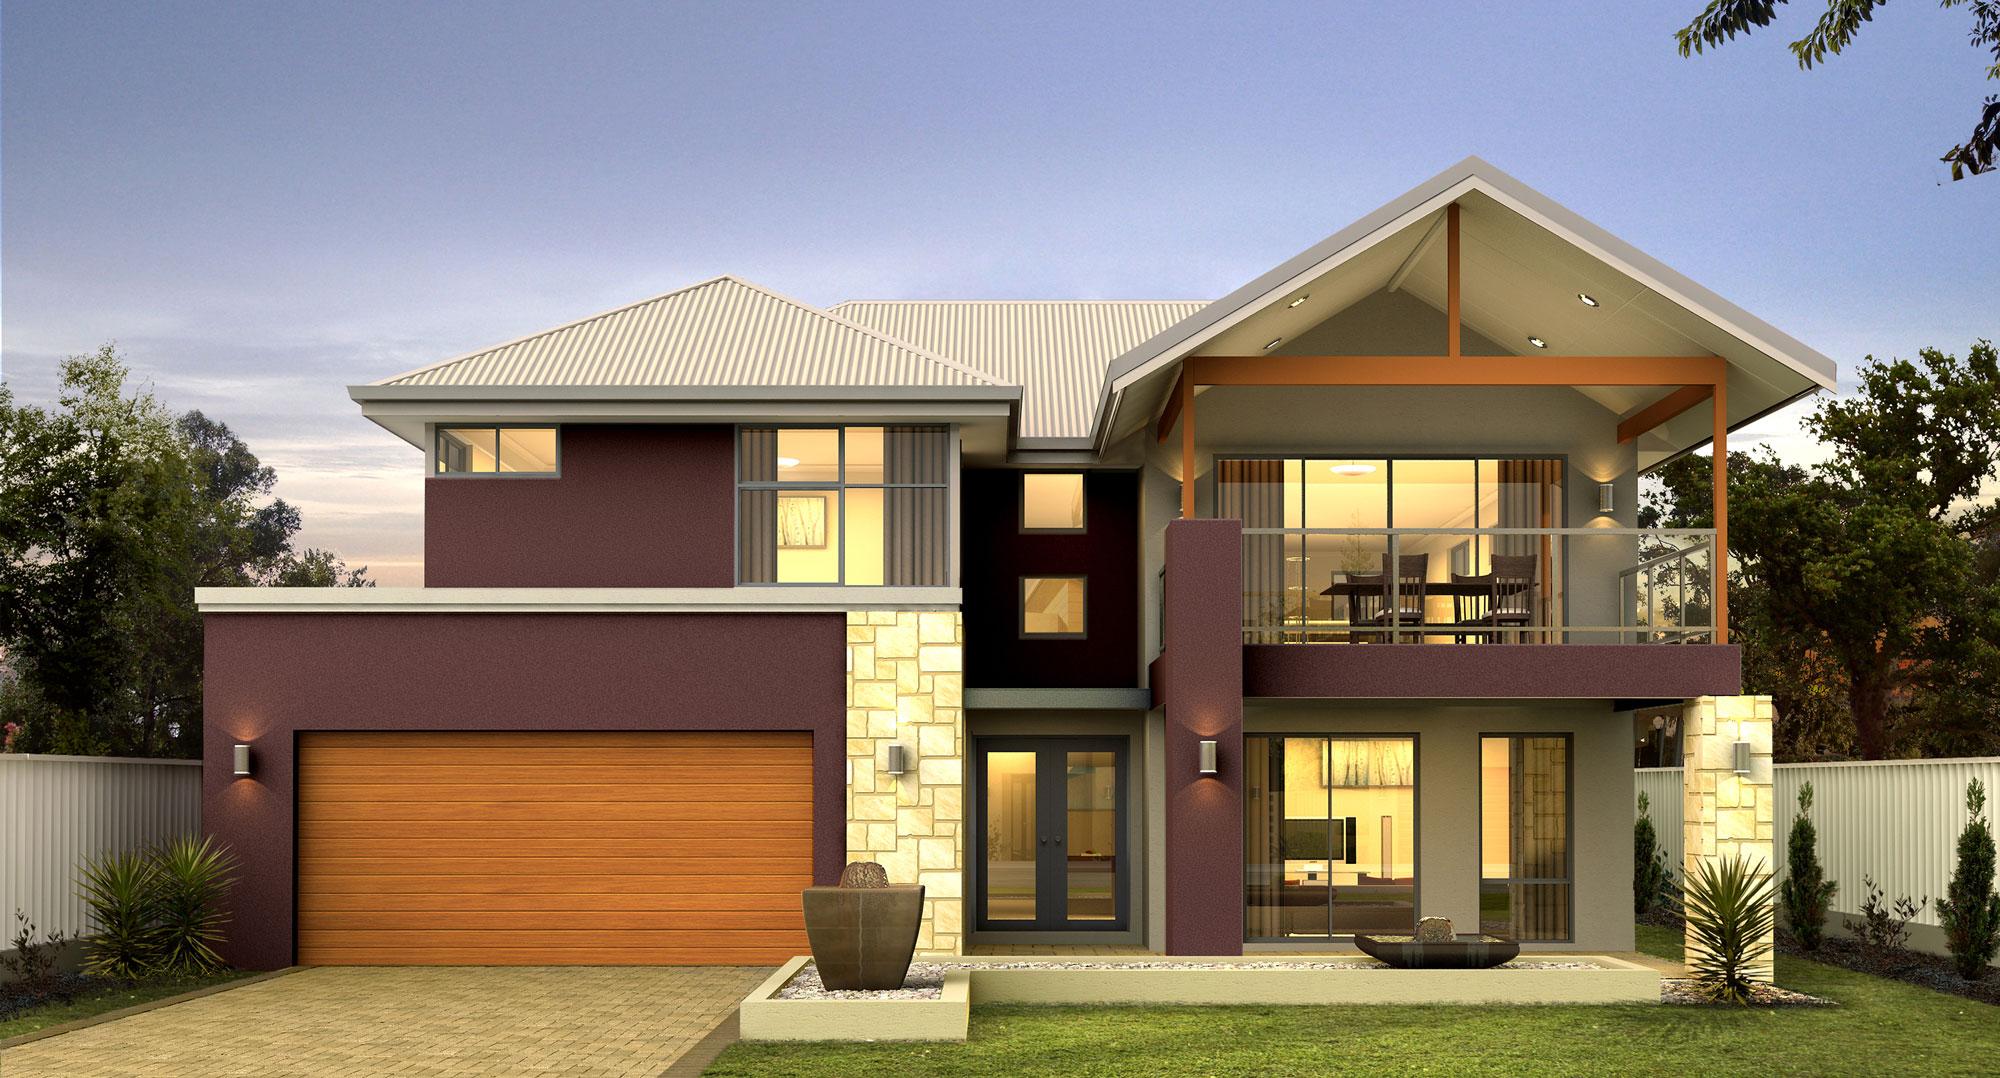 Majorca 2000_0 - modern house design